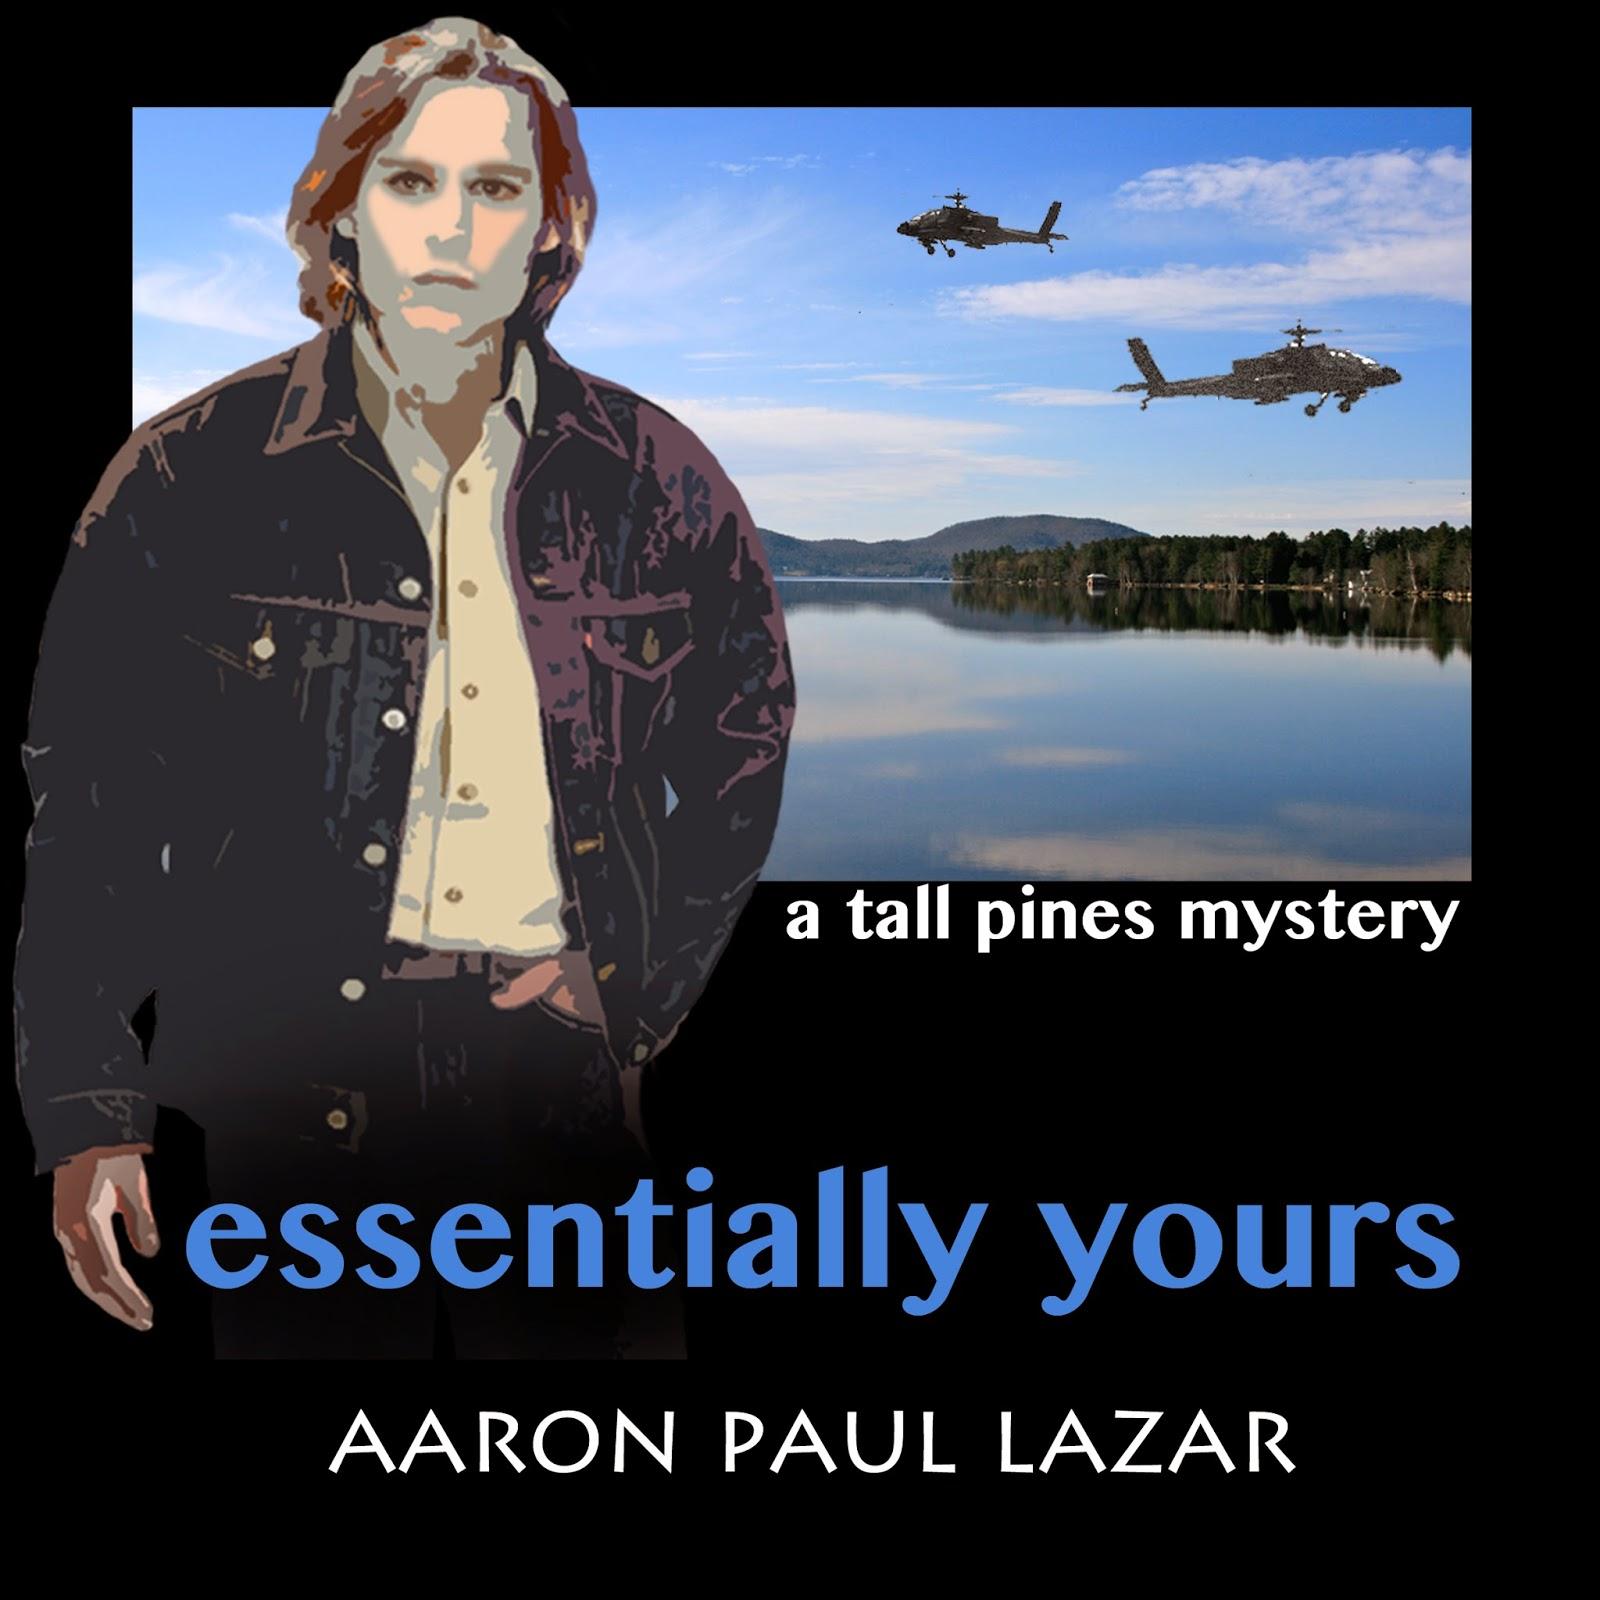 http://www.amazon.com/Essentially-Yours-Aaron-Paul-Lazar-ebook/dp/B007KPBBP6/ref=pd_sim_kstore_2?ie=UTF8&refRID=0QG6XCM0A12P5SC03TE0